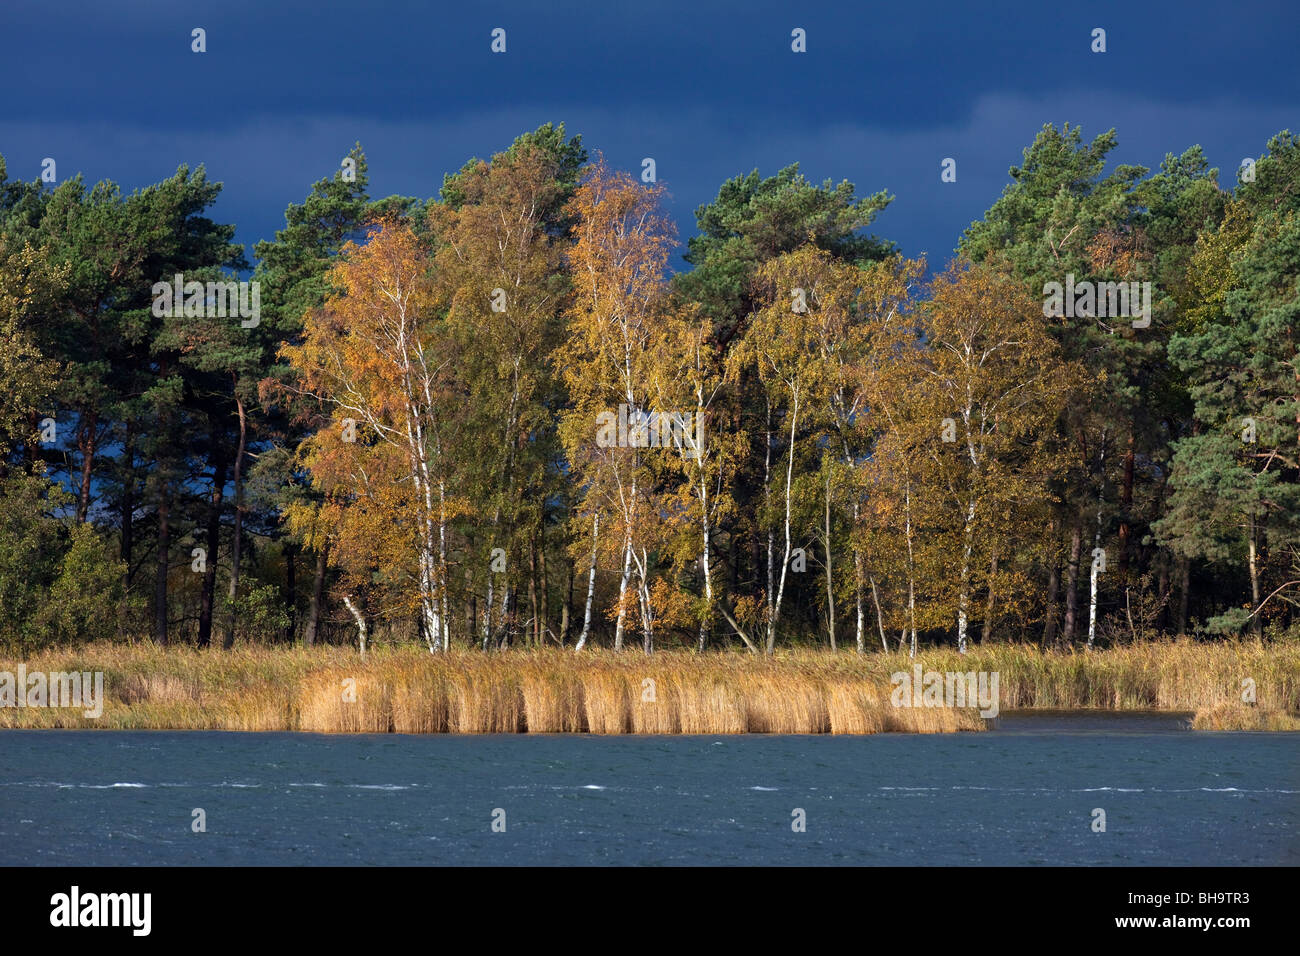 Island of Bock, Western Pomerania Lagoon Area National Park, Germany - Stock Image